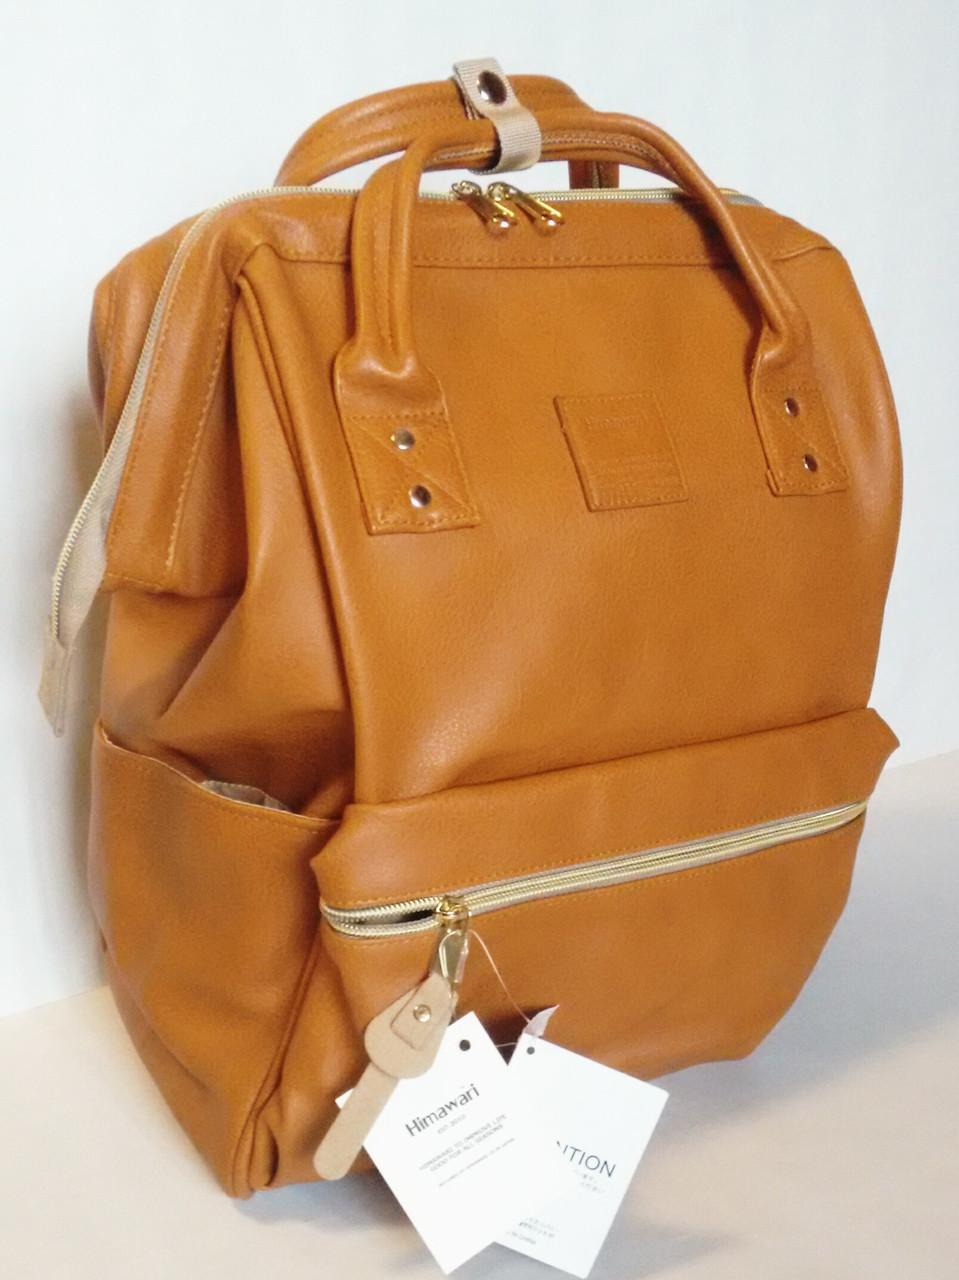 Стильна універсальна сумка рюкзак Himawari 193 коричнева для покупок, для мам, студентам, школярам